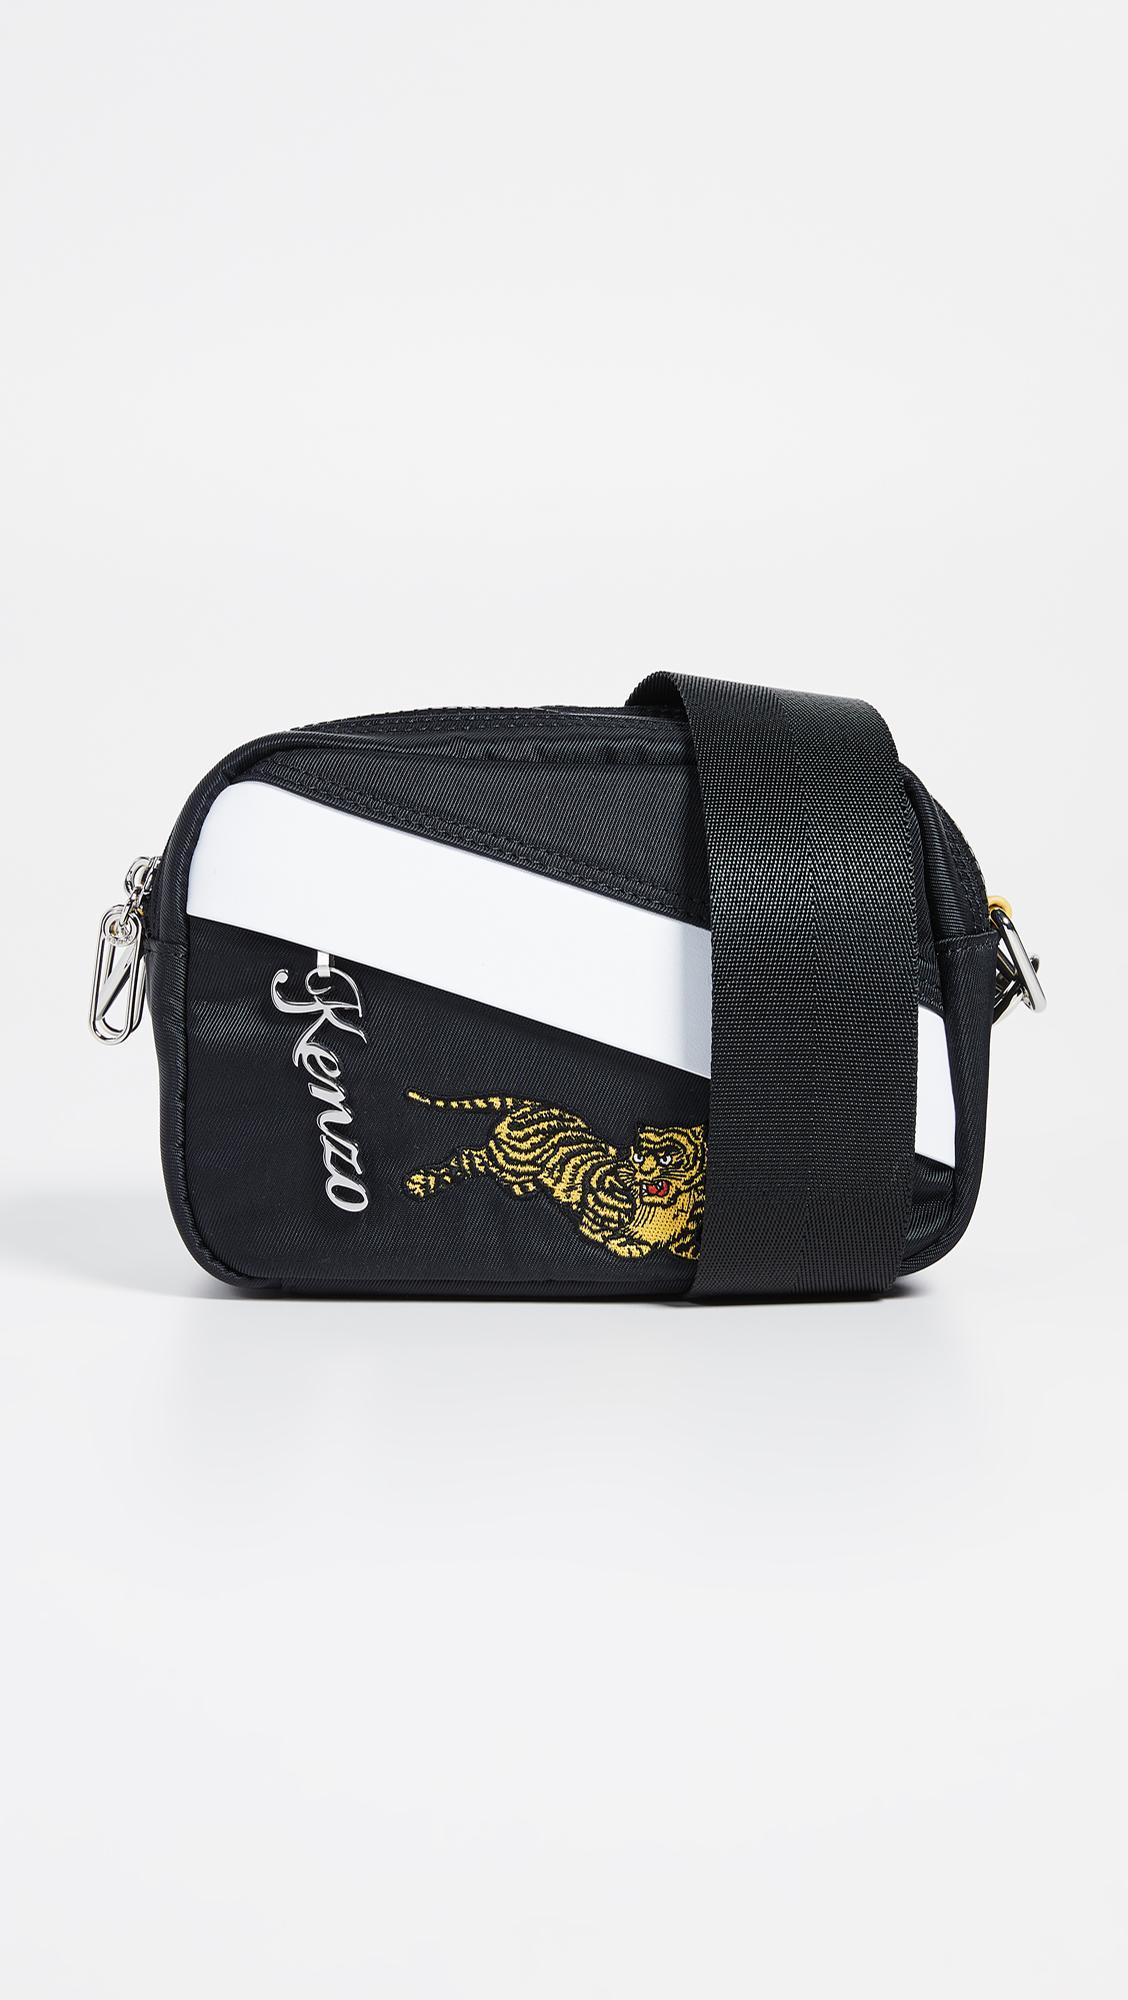 c6e5a15e6 KENZO Jumping Tiger Crossbody Bag in Black for Men - Lyst